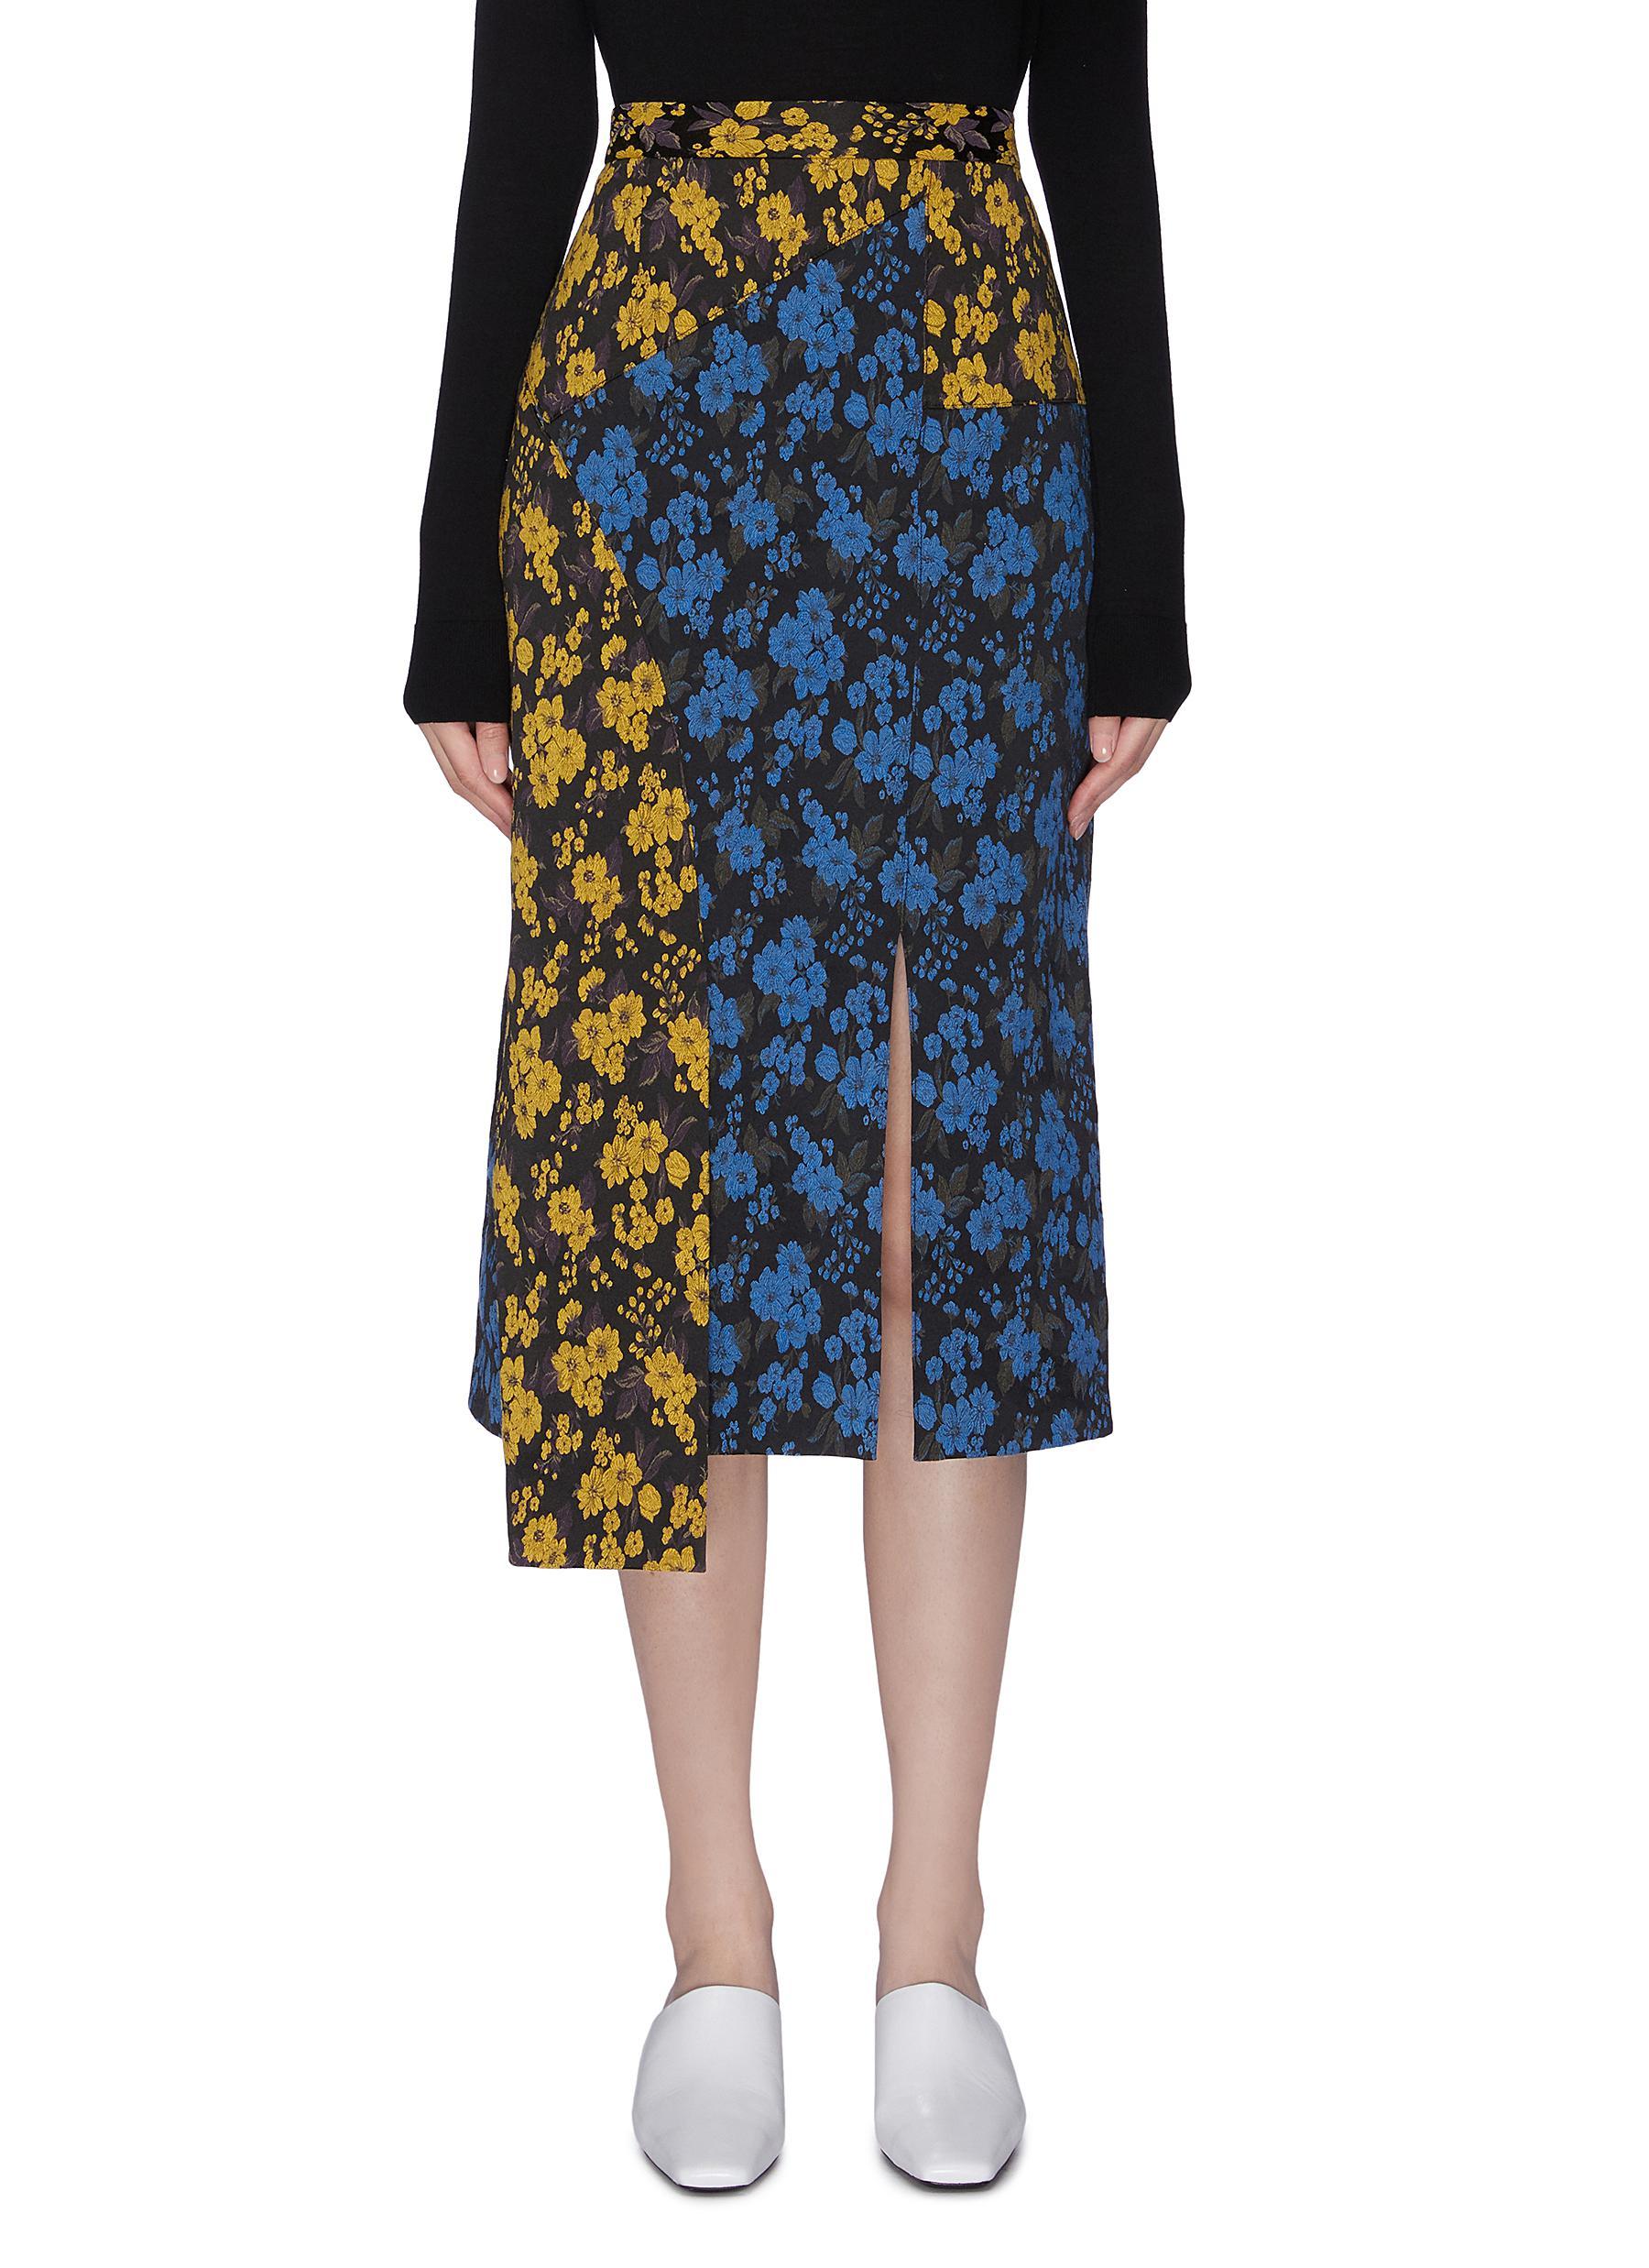 Floral Power colourblock panelled asymmetrical slit skirt by Snow Xue Gao